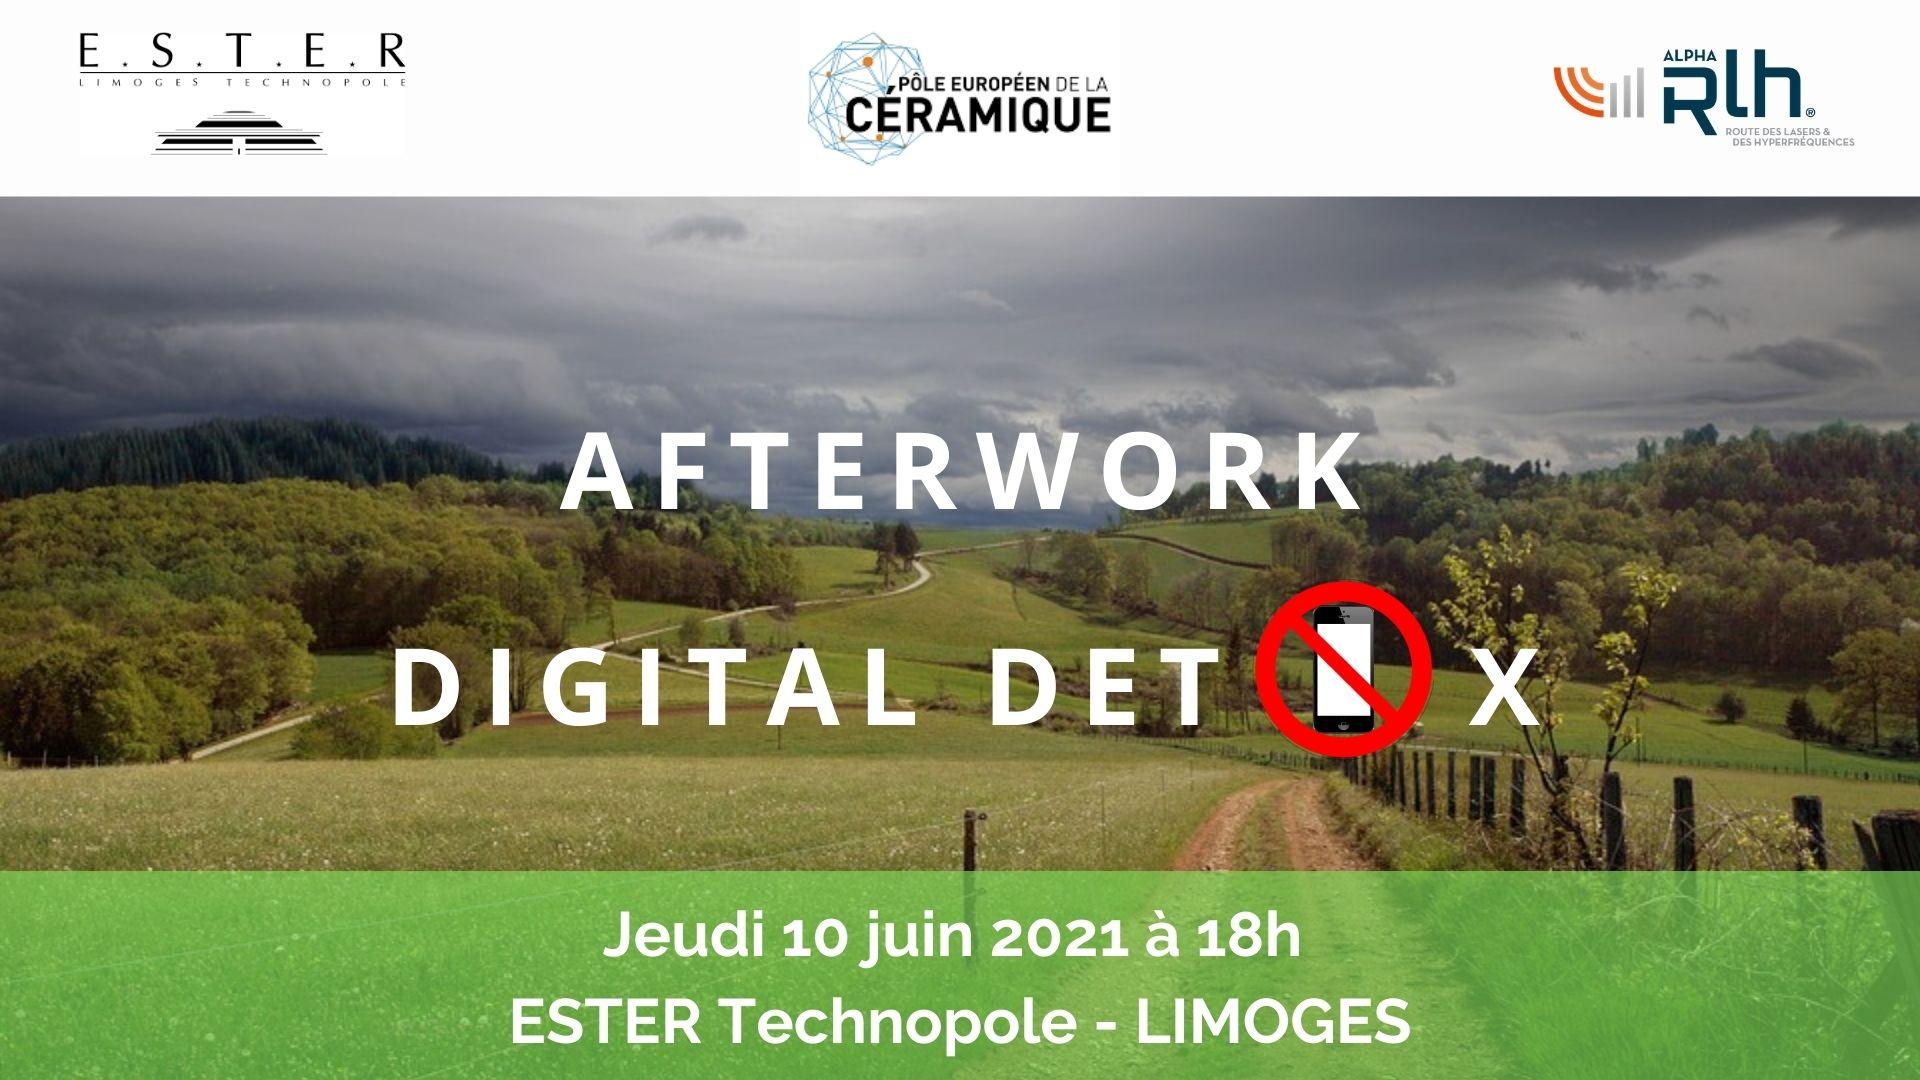 Afterwork Digital Detox